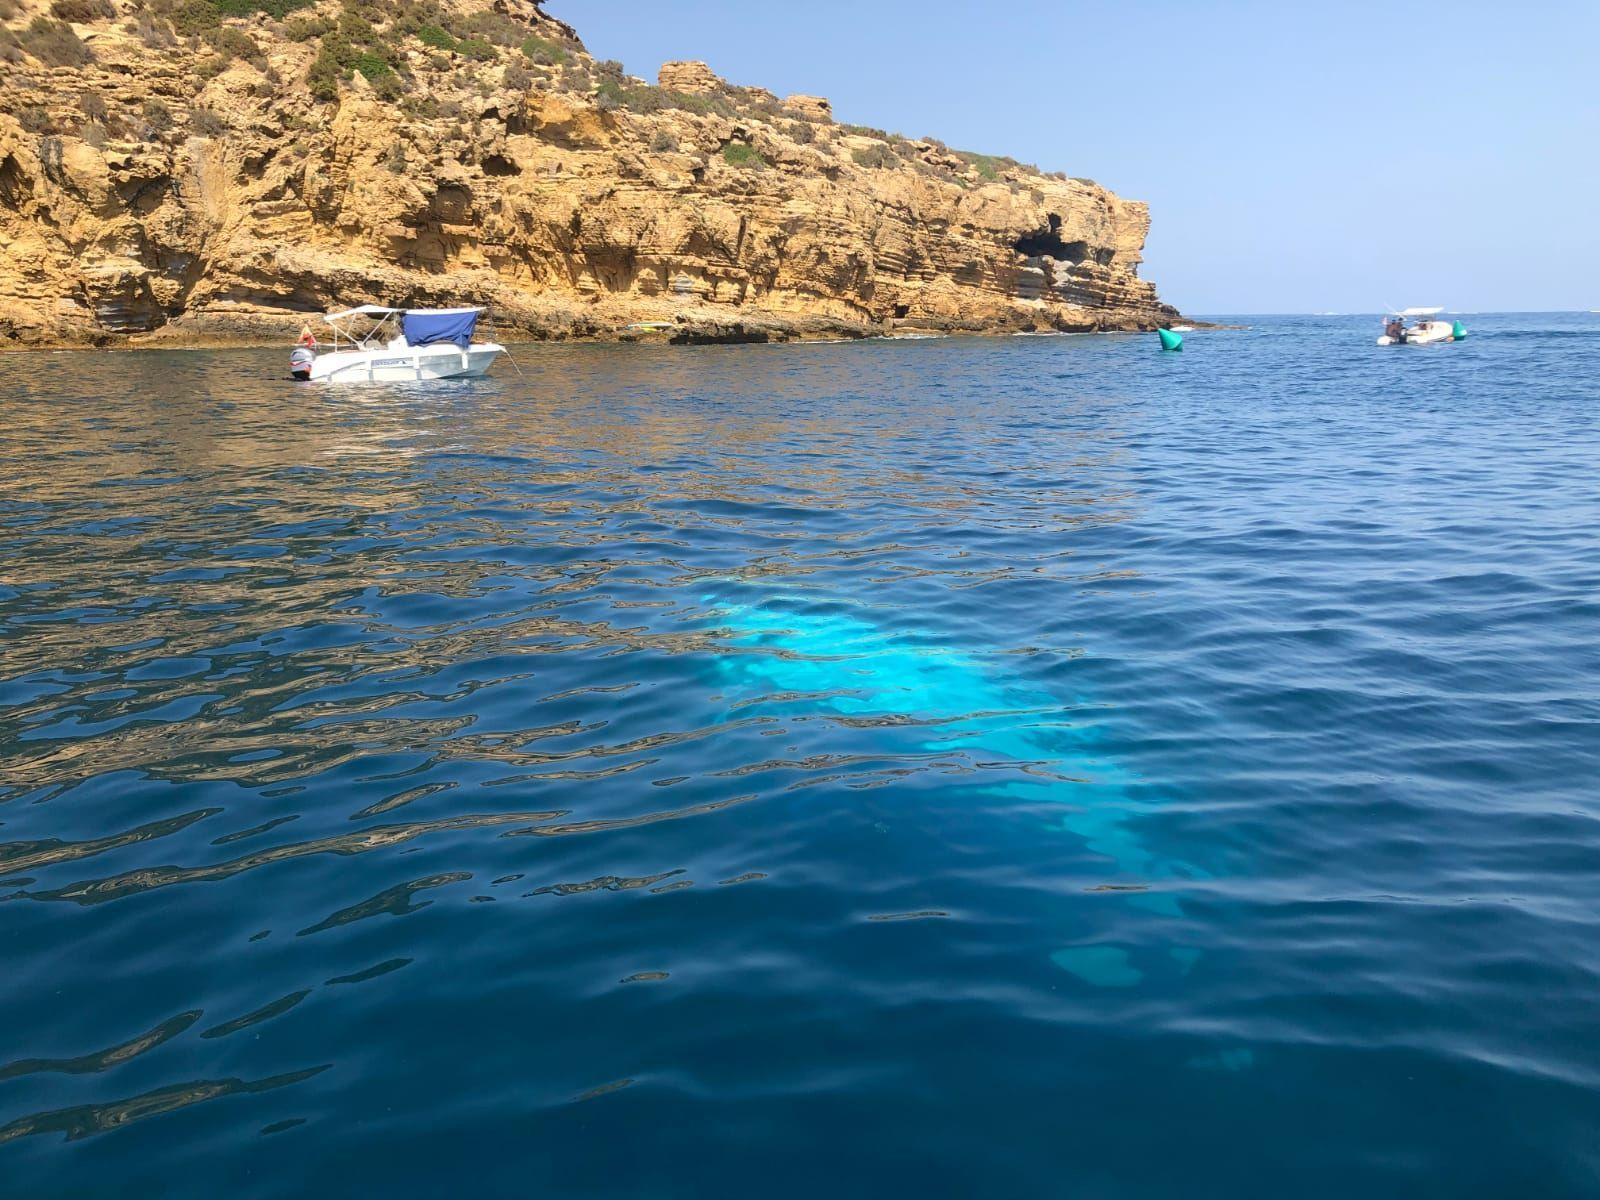 Isla de Portitxol